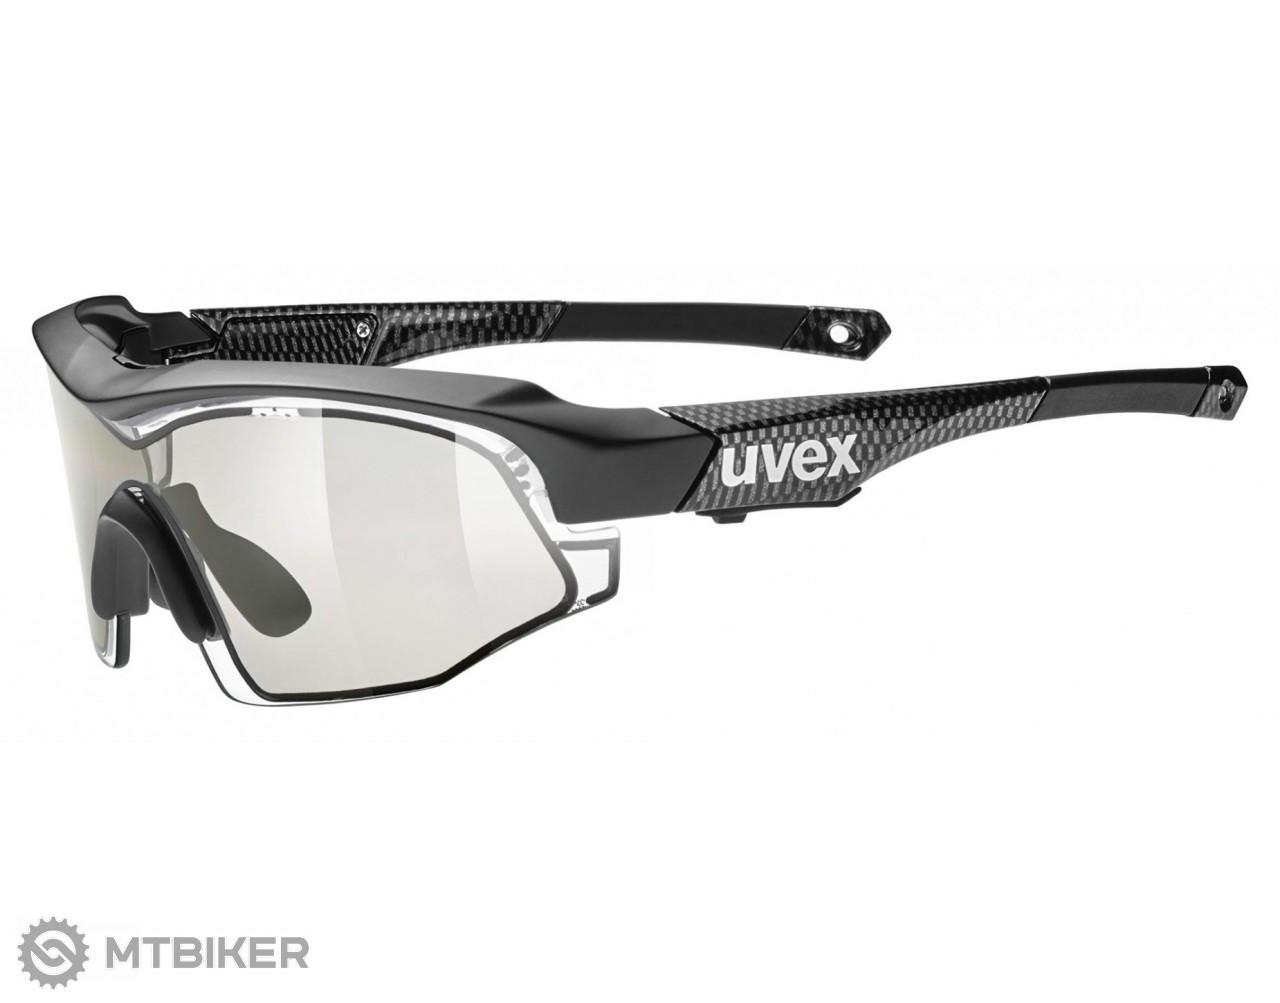 Uvex Variotronic S okuliare black karbon - MTBIKER Shop 10589ec2ee1